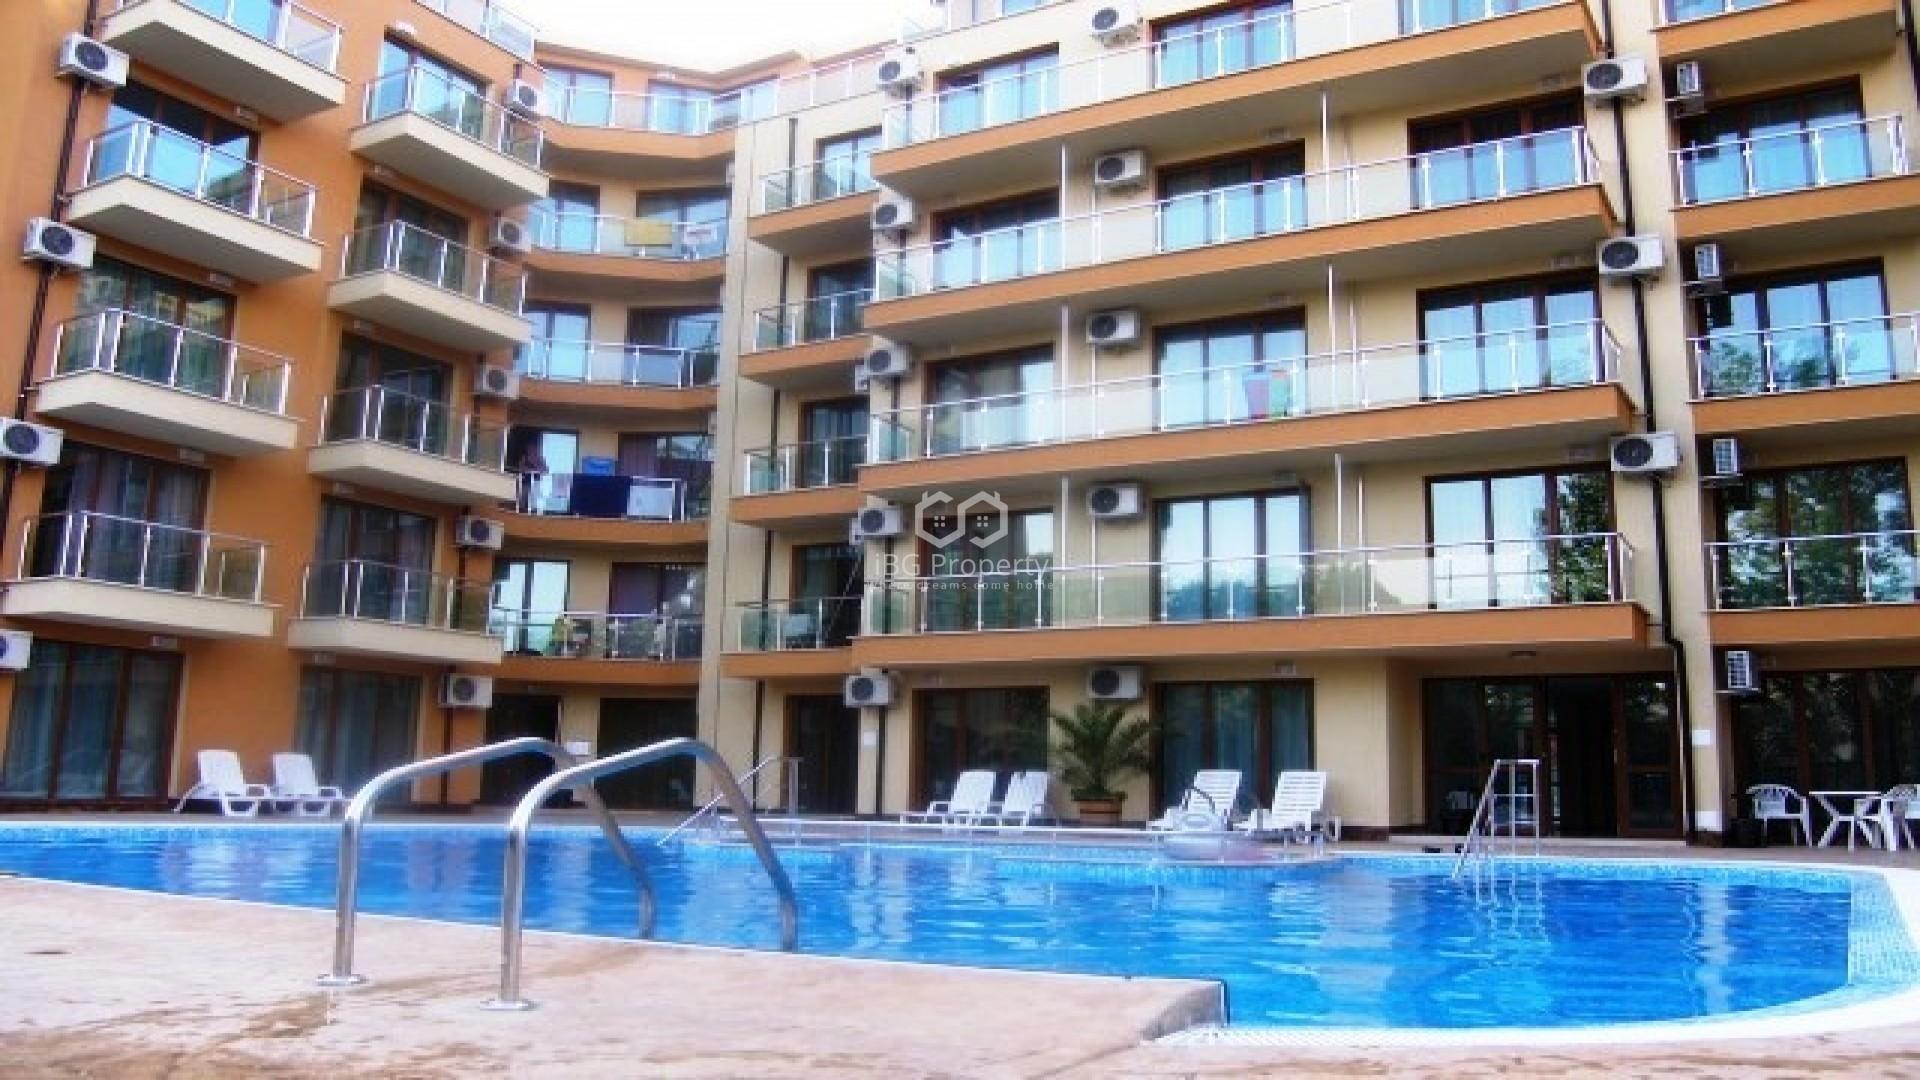 Eдностаен апартамент Слънчев Бряг 36,5 m2